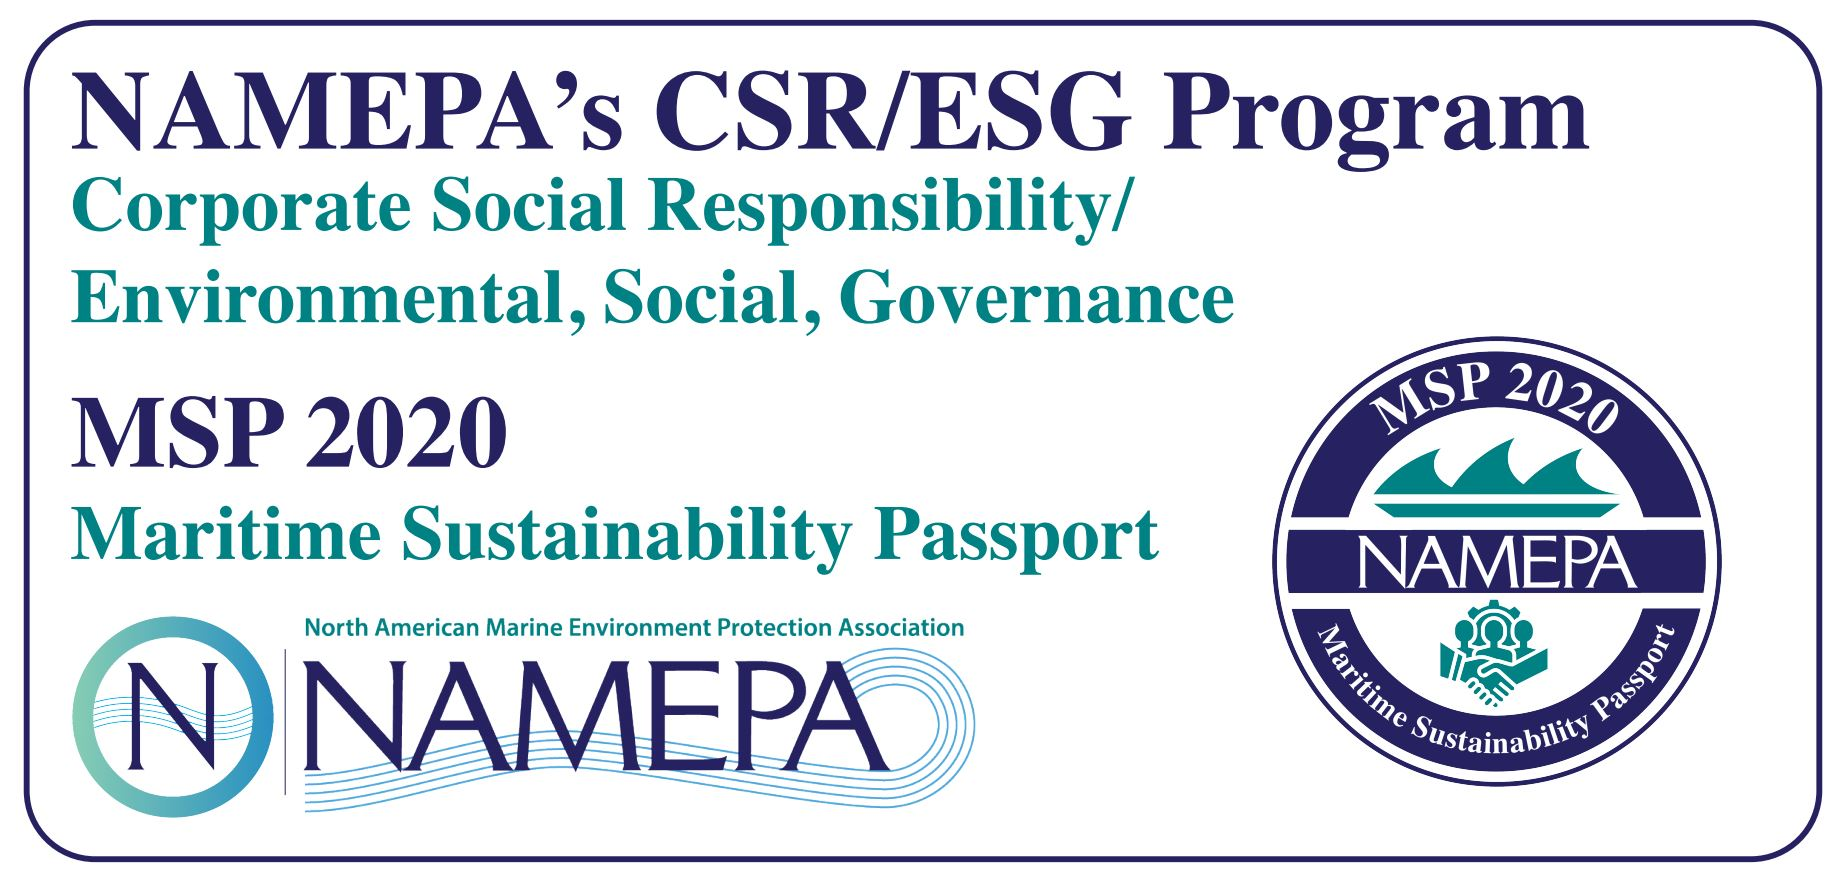 CSR-ESG